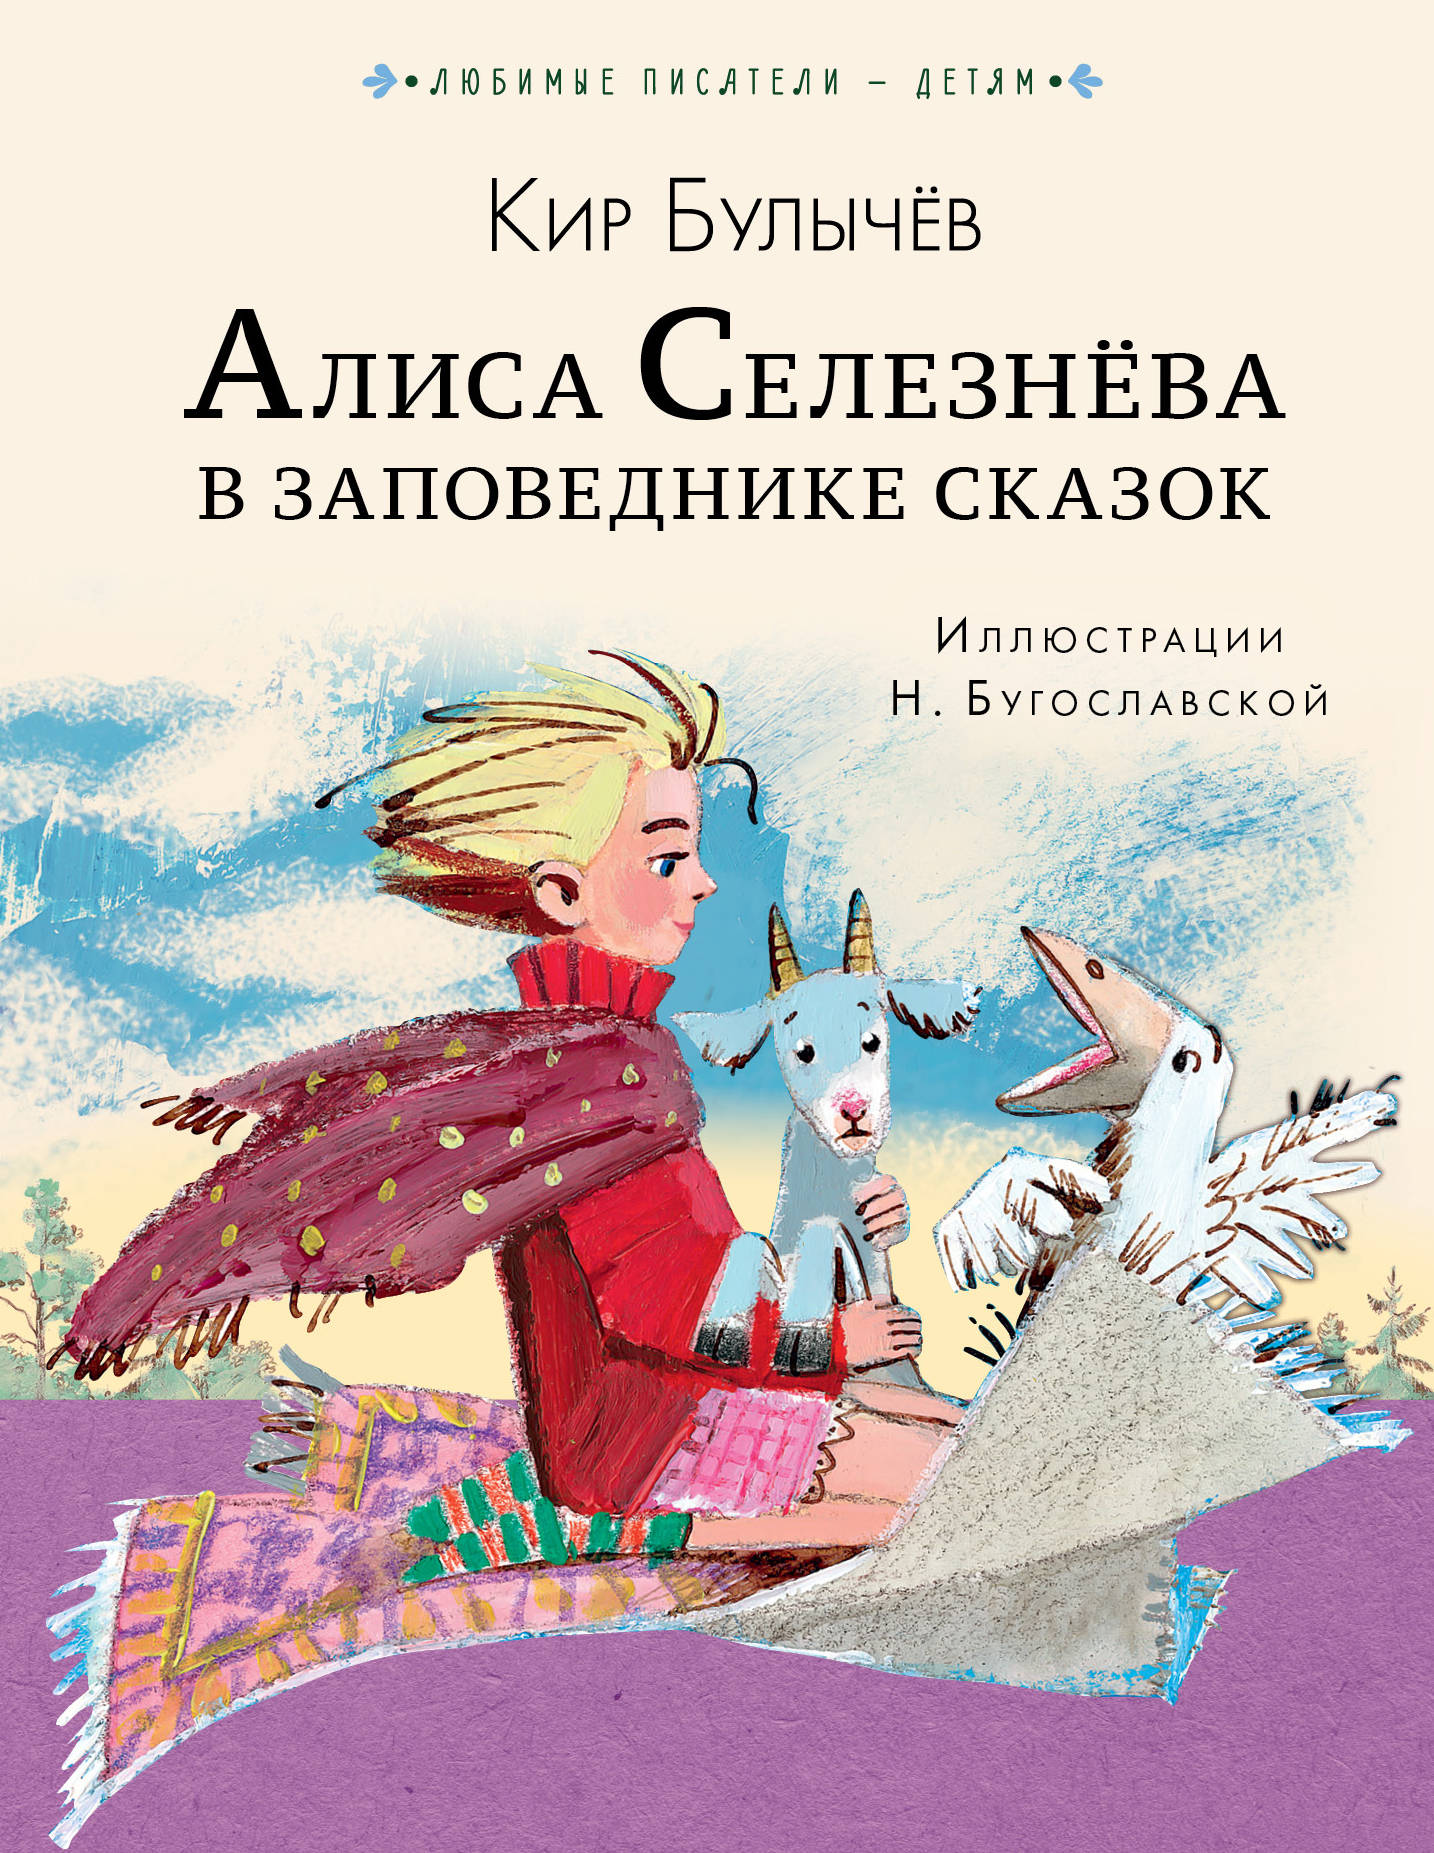 Алиса Селезнева в Заповеднике сказок